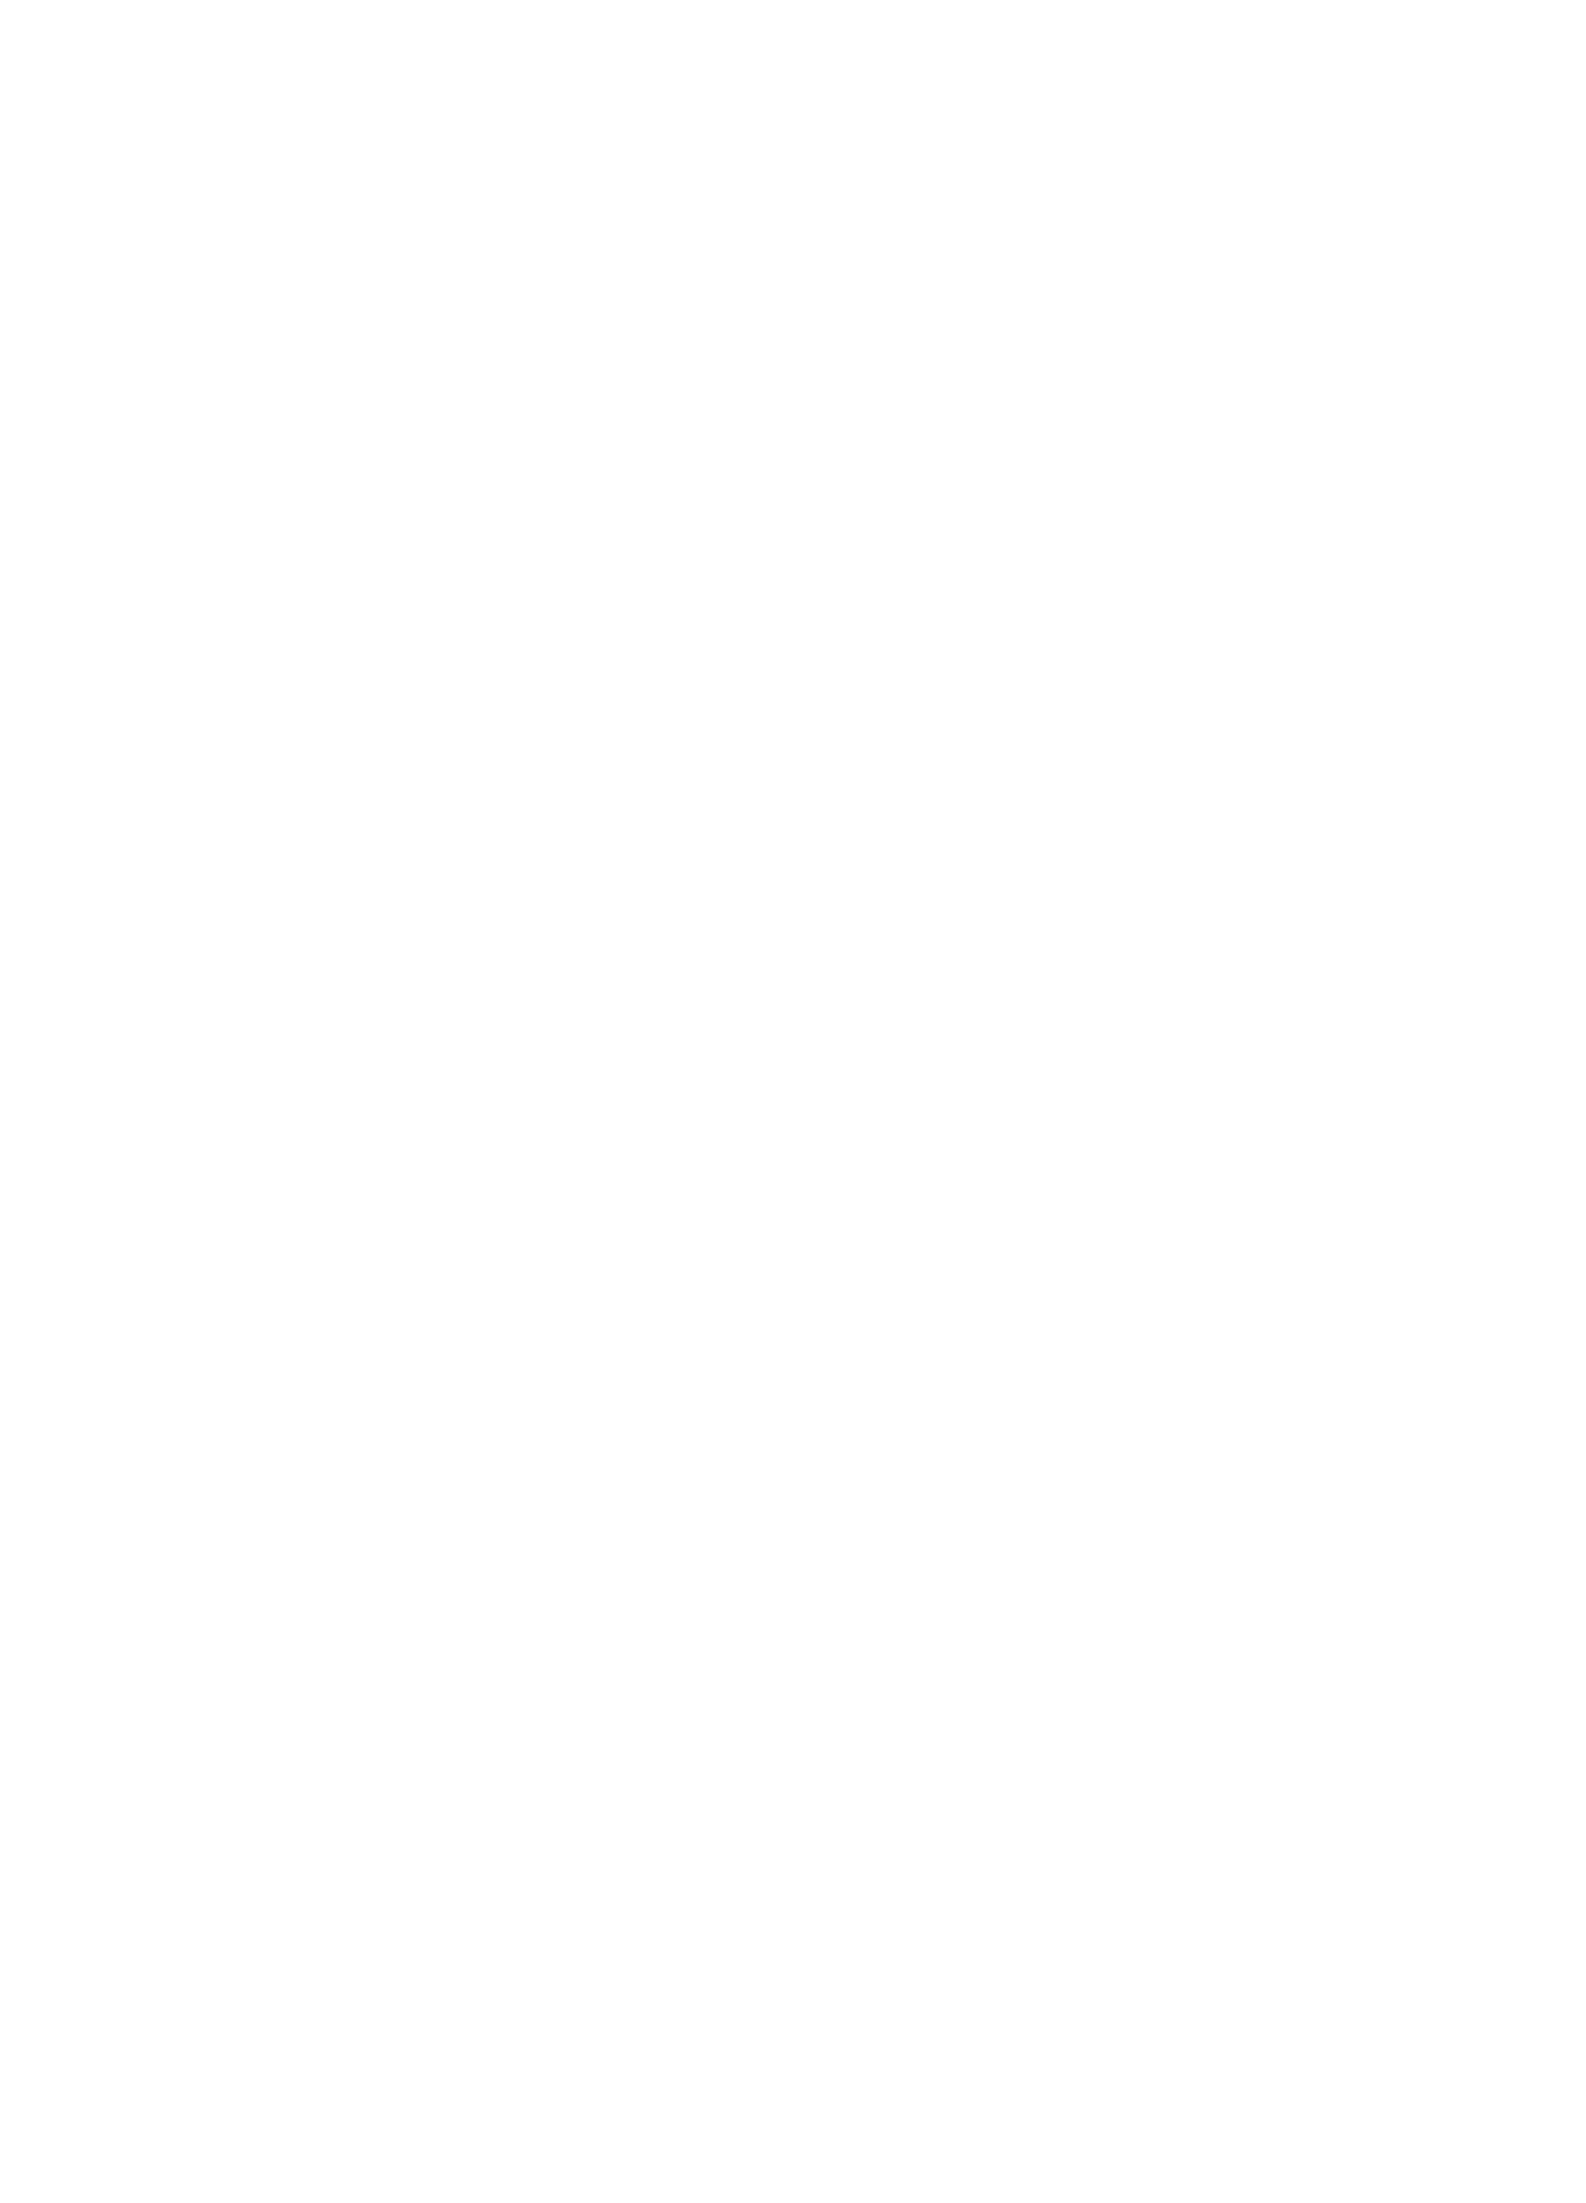 Franklin Road Baptist Church